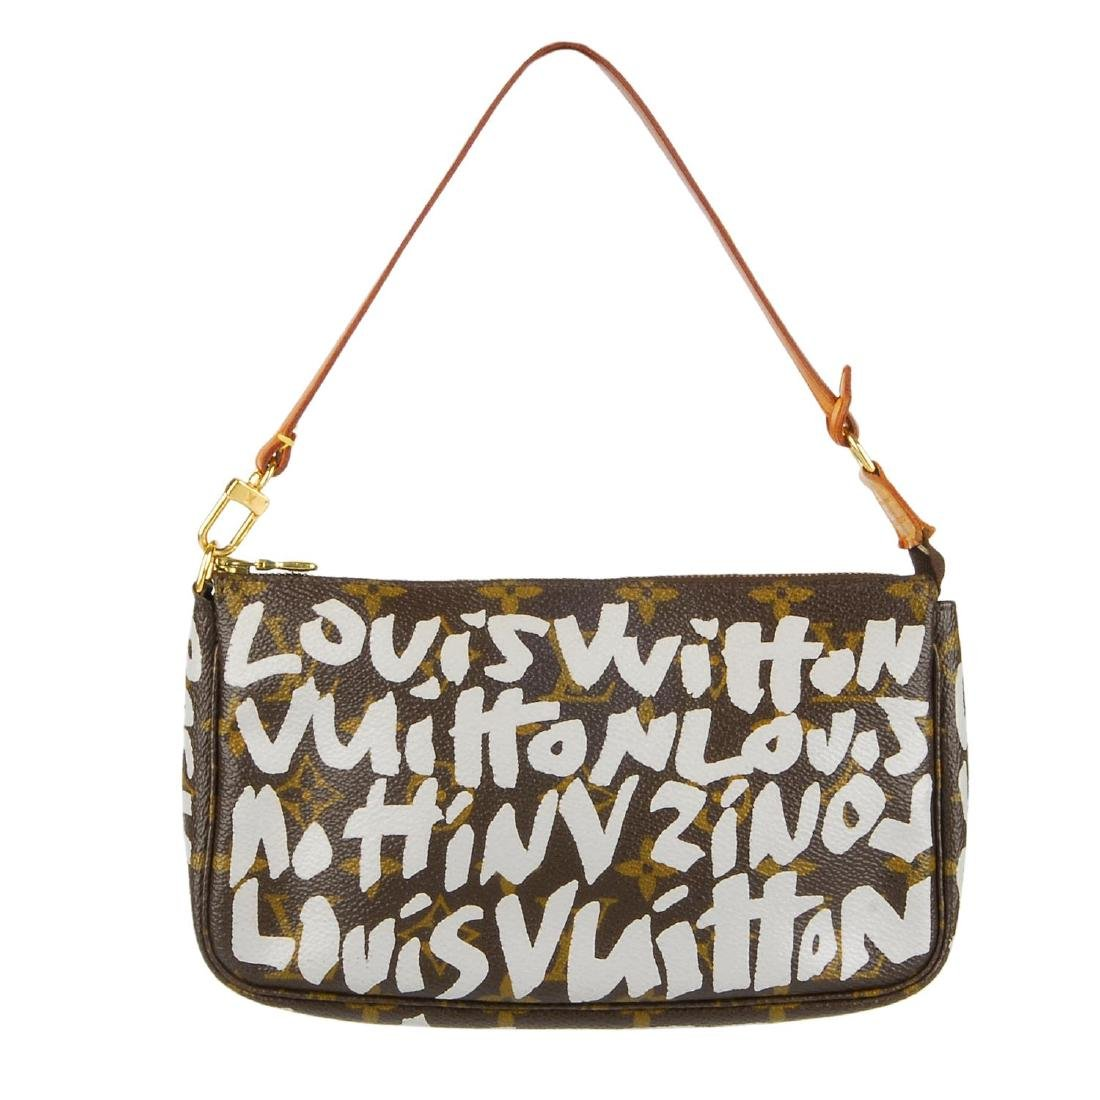 LOUIS VUITTON - a Monogram Graffiti Pochette